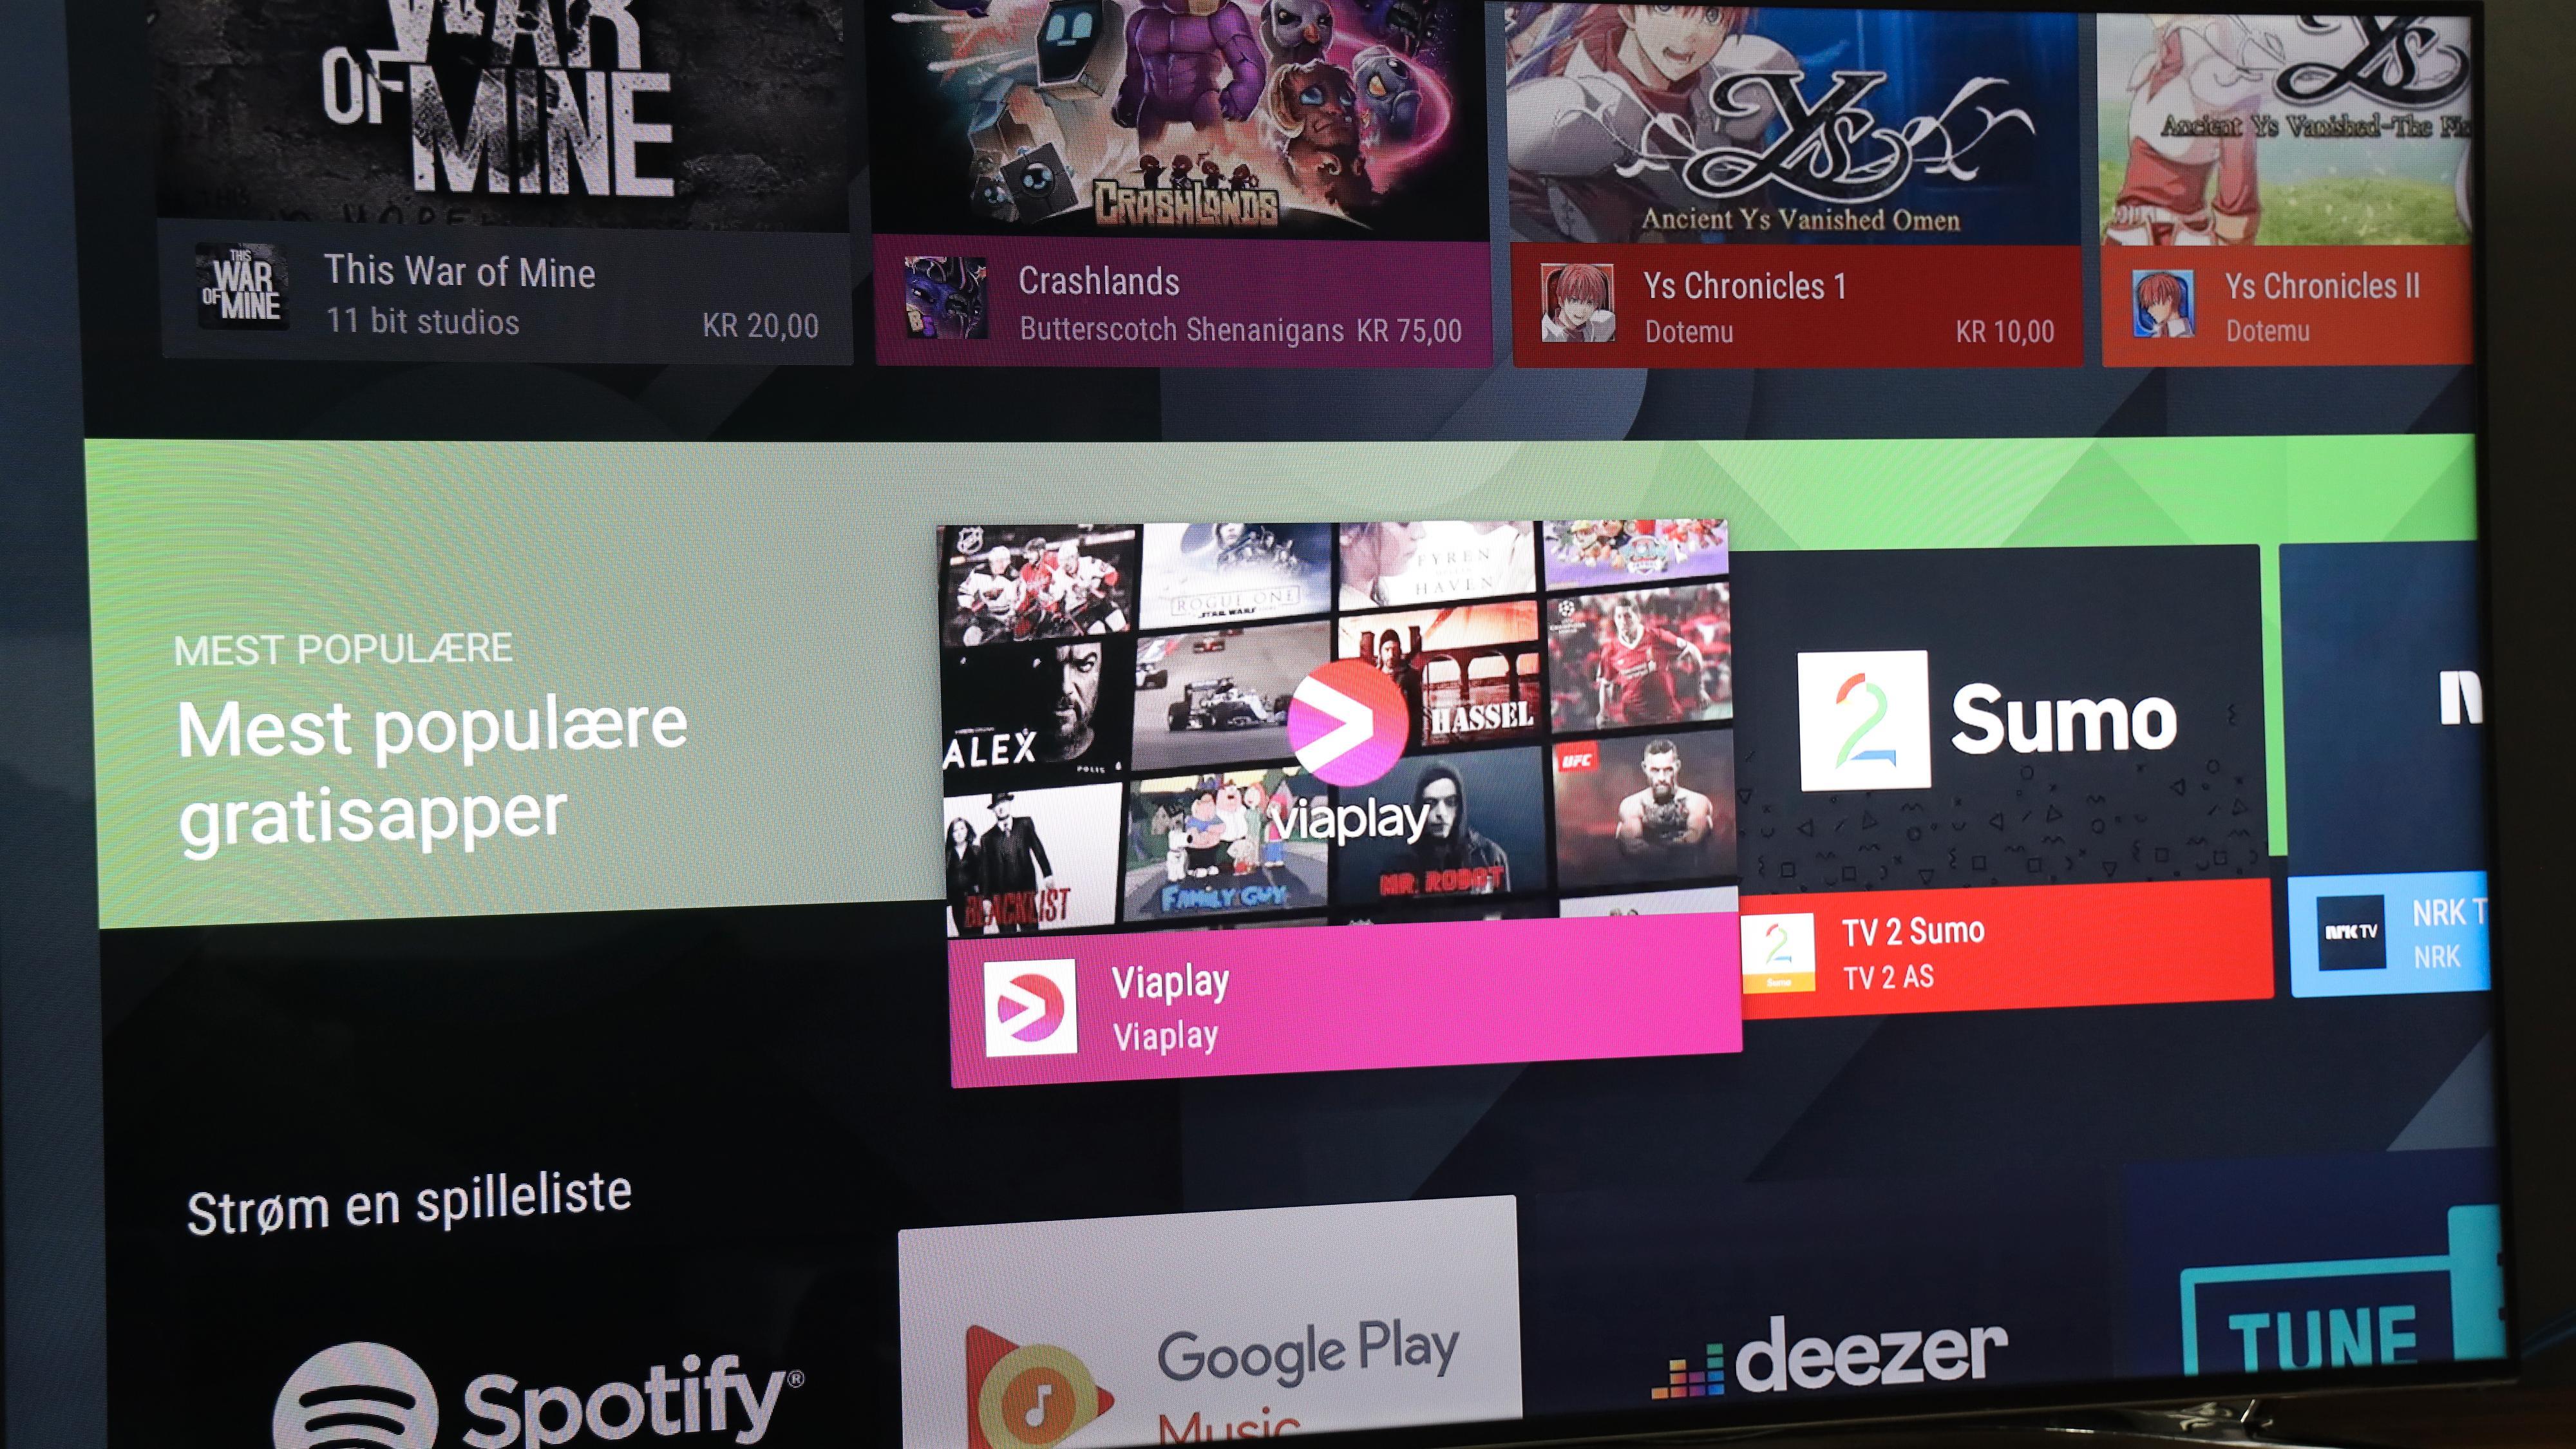 Siden Get-boksen er en Android TV-boks, kan du fylle den med apper fra Google Play Store. Dermed kan du eksempelvis installere appene til andre norske TV-operatører om du har tilgang til flere.